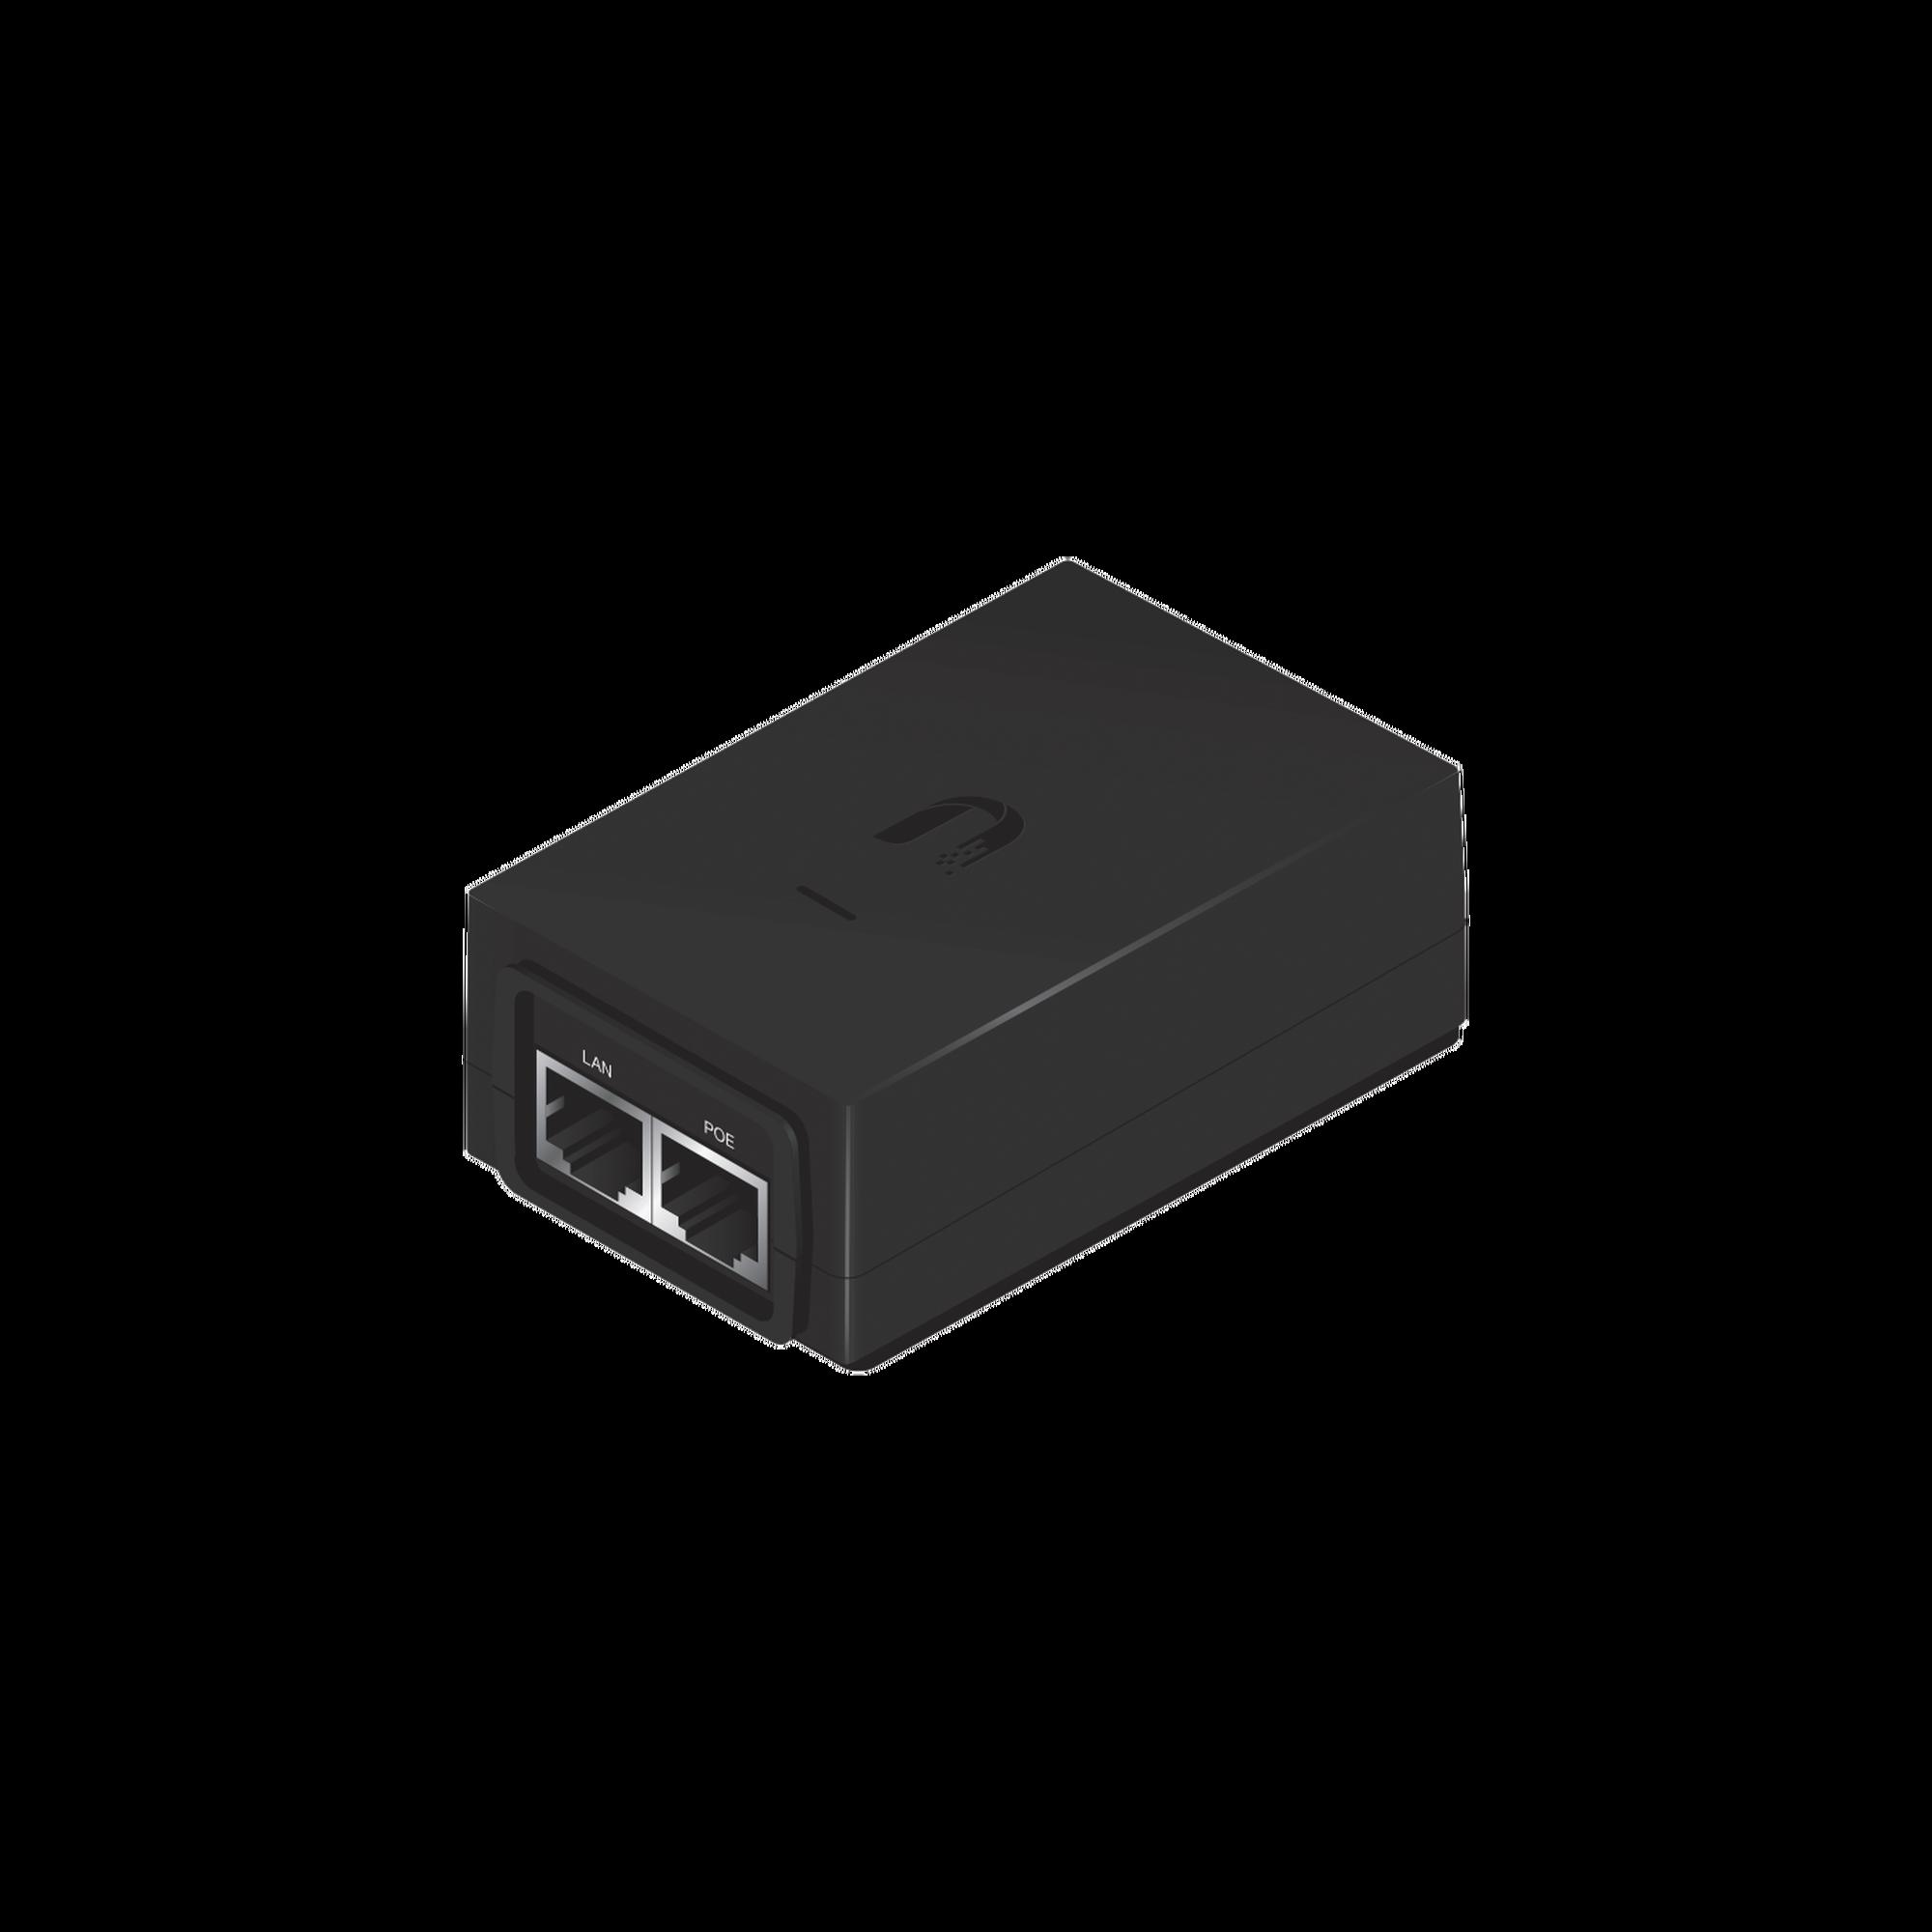 Adaptador PoE Ubiquiti de 24 VDC, 1.25 A con puerto Gigabit